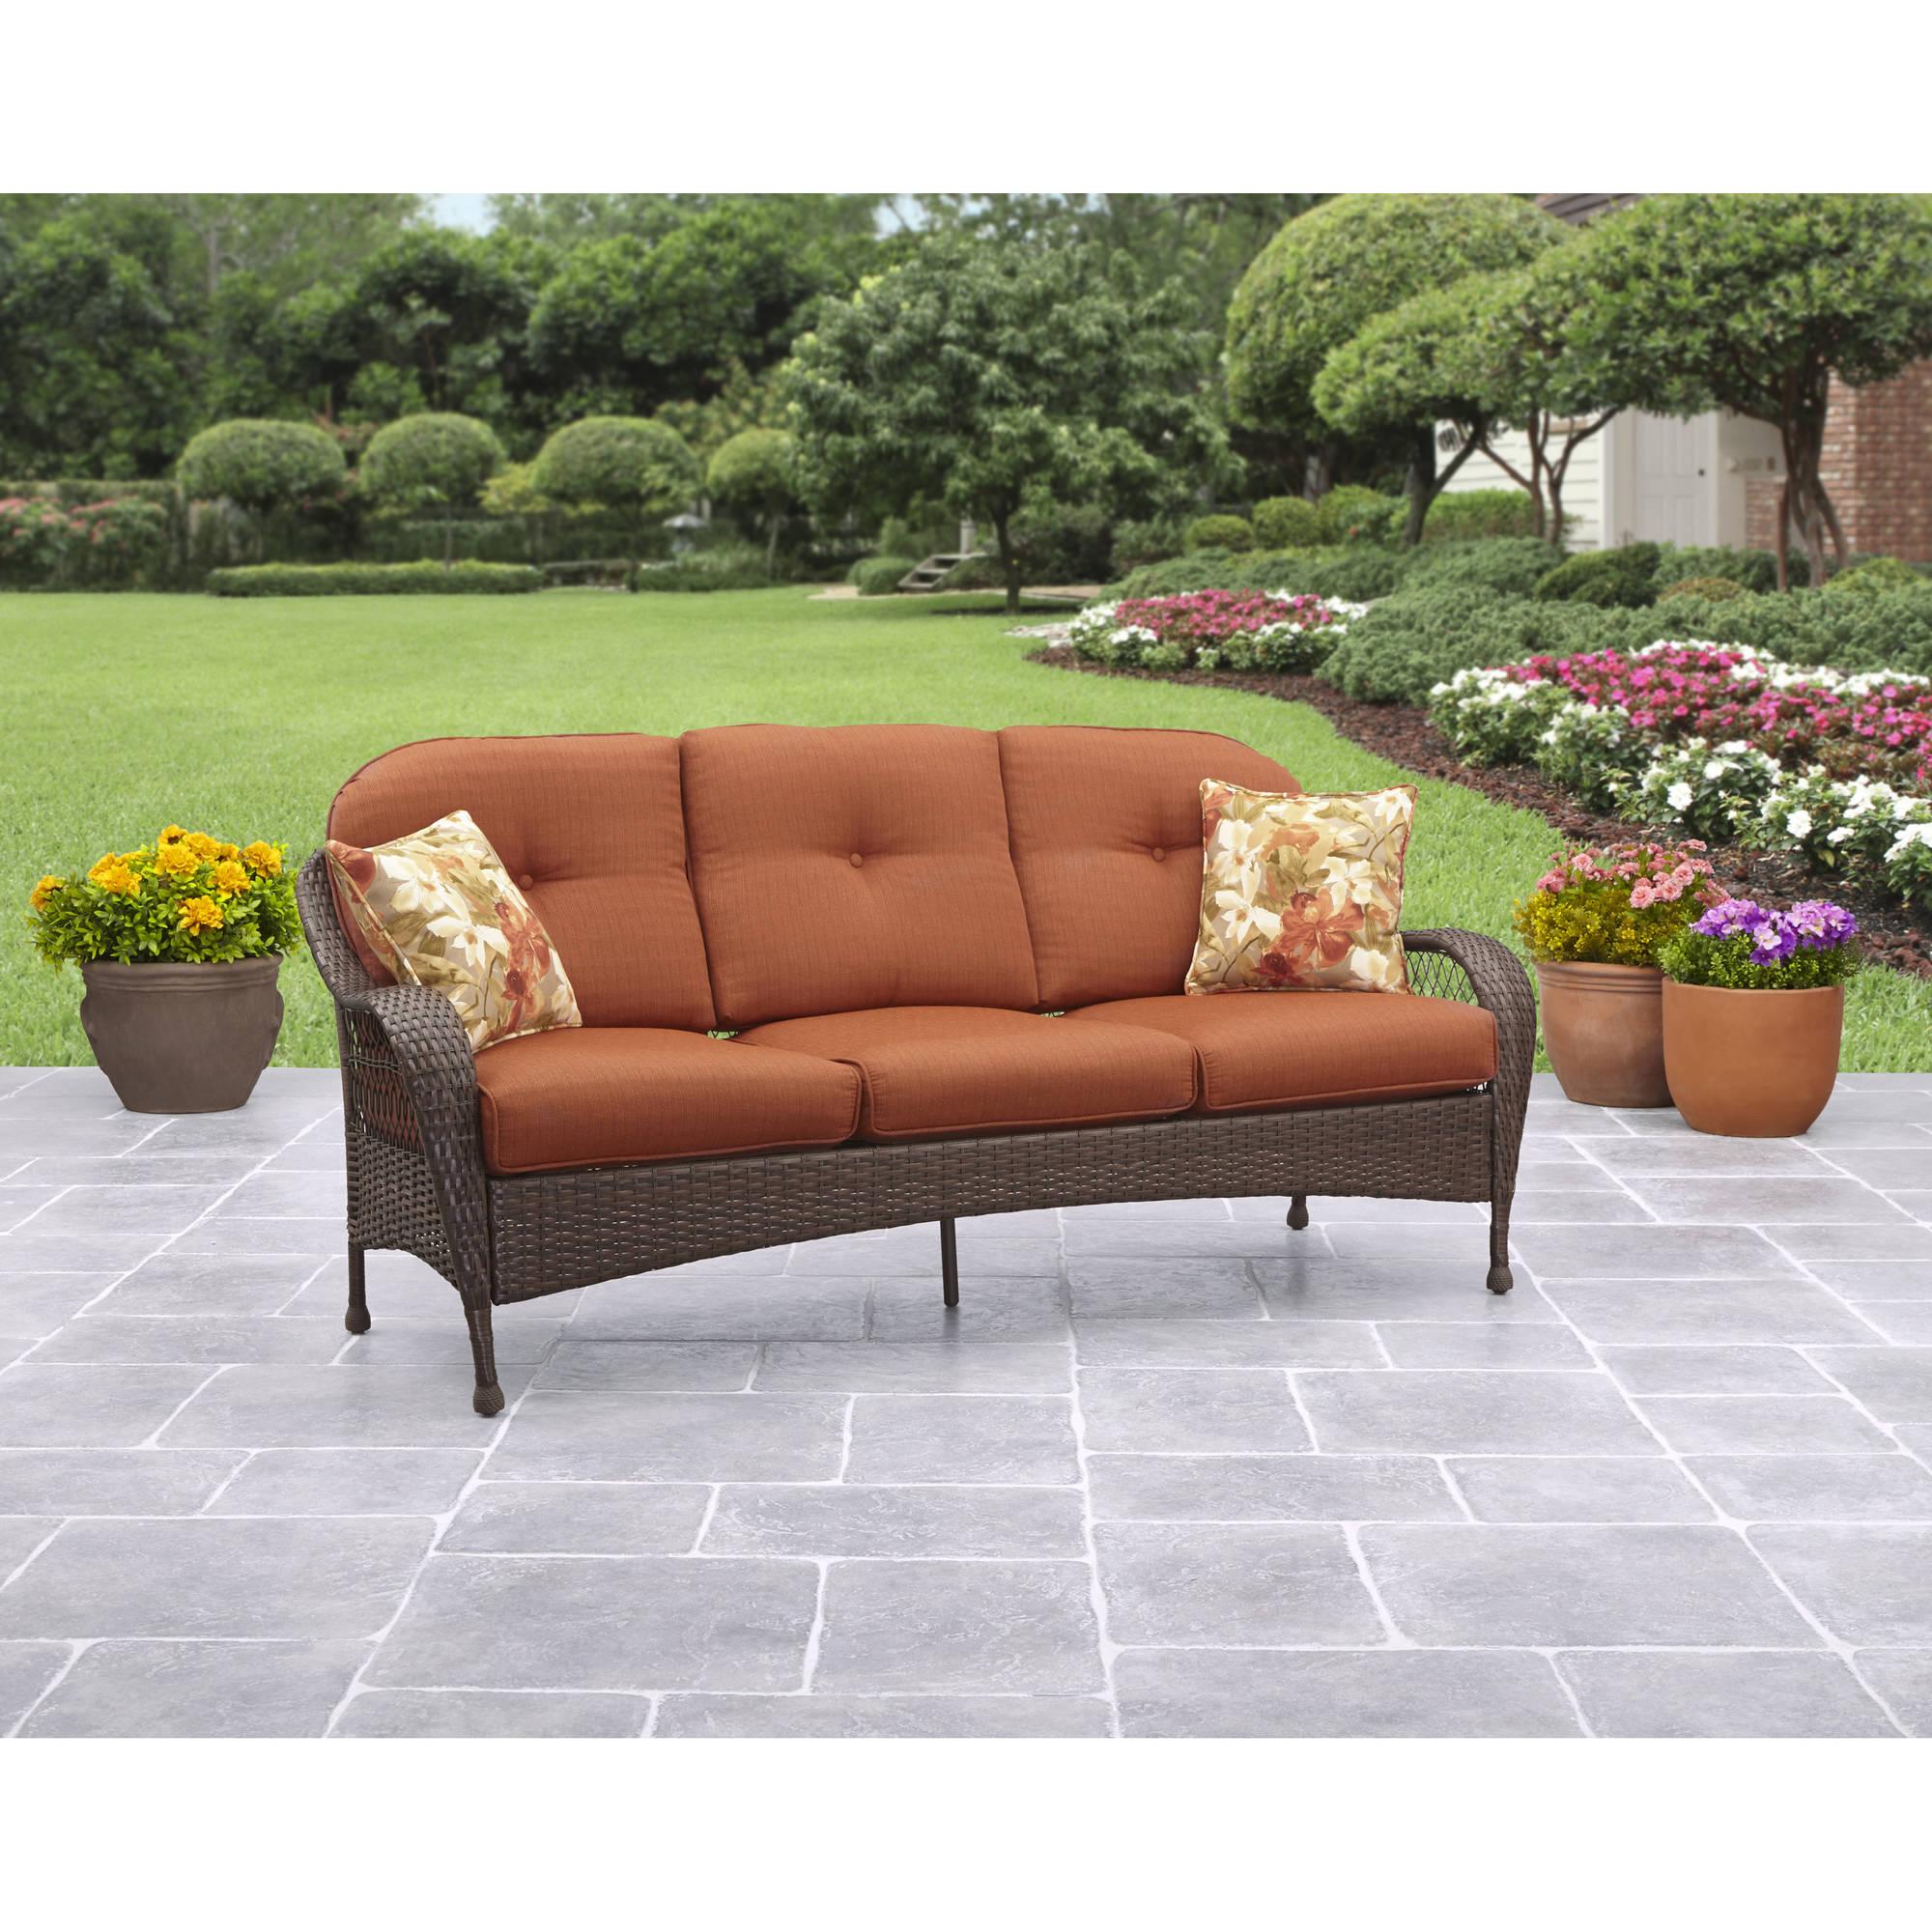 better homes and gardens azalea ridge outdoor sofa, seats 3 - walmart.com YPWGMJS